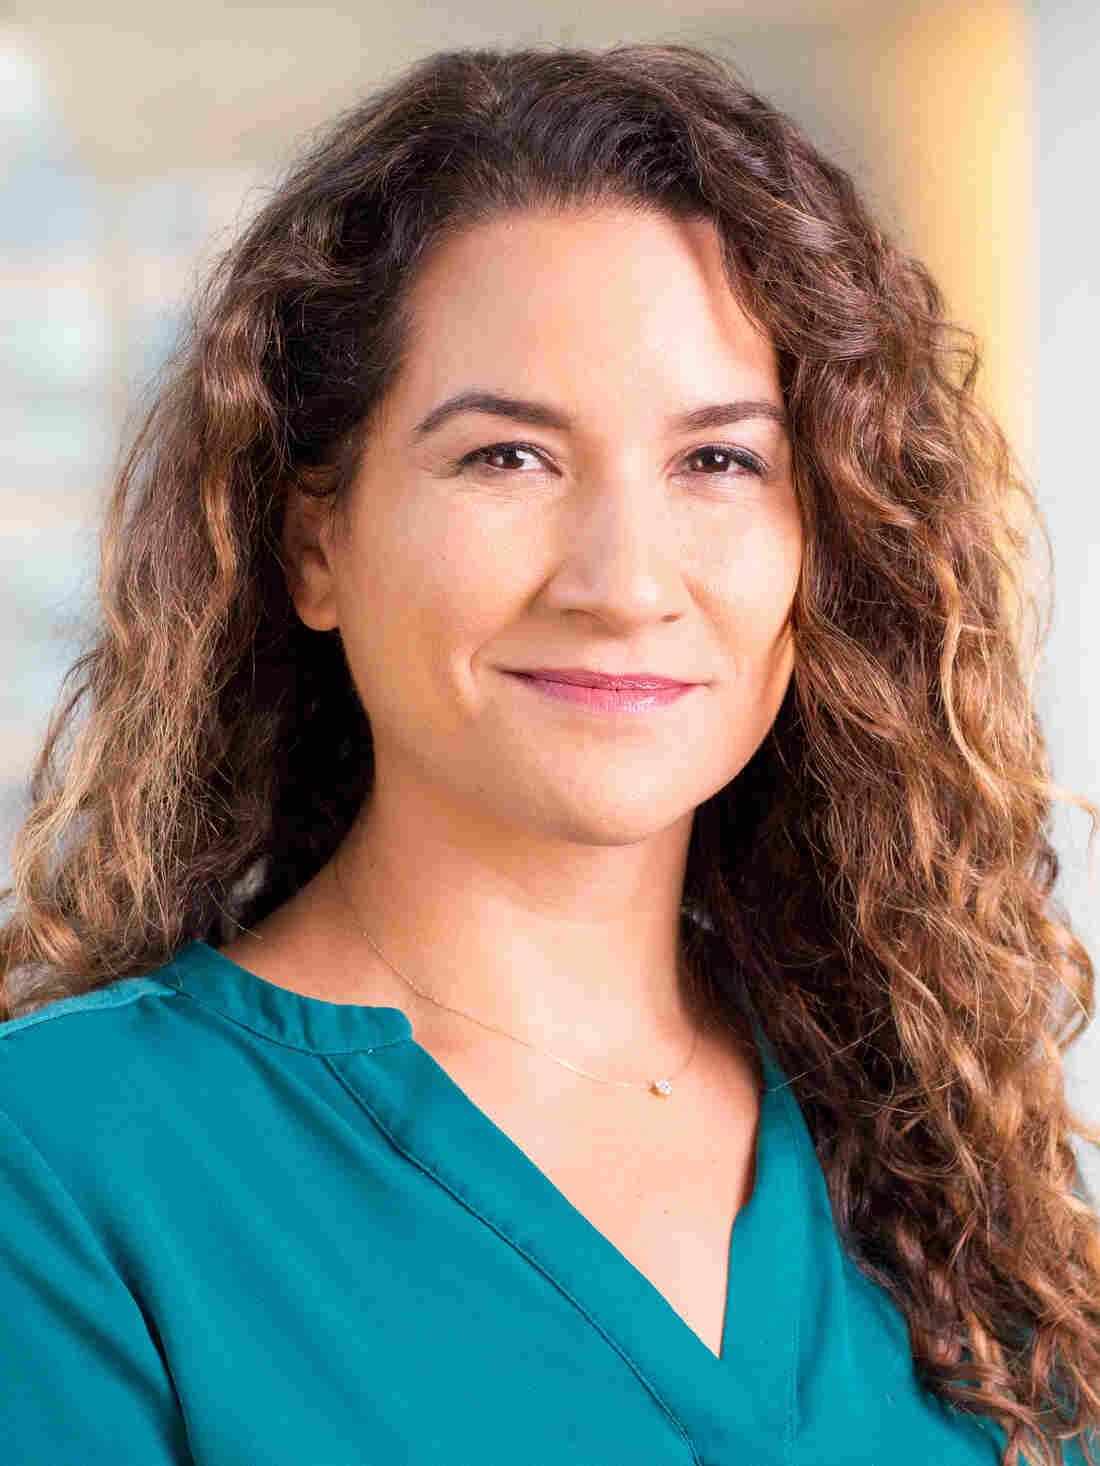 Leila Fadel at NPR headquarters in Washington, D.C., September 27, 2018. (photo by Allison Shelley)